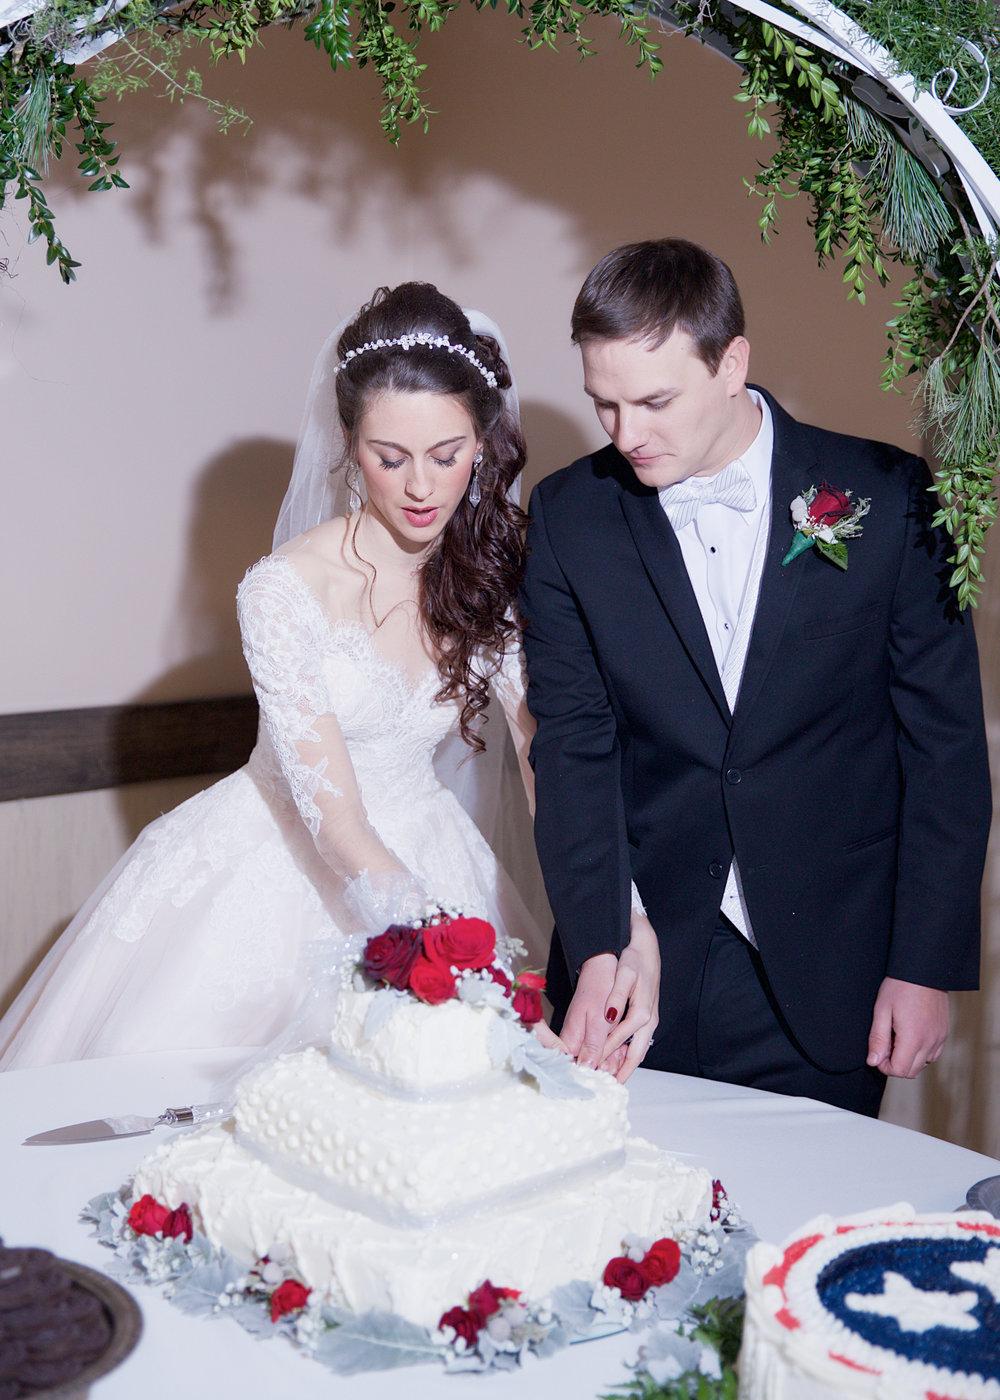 34-cake-cutting.jpg